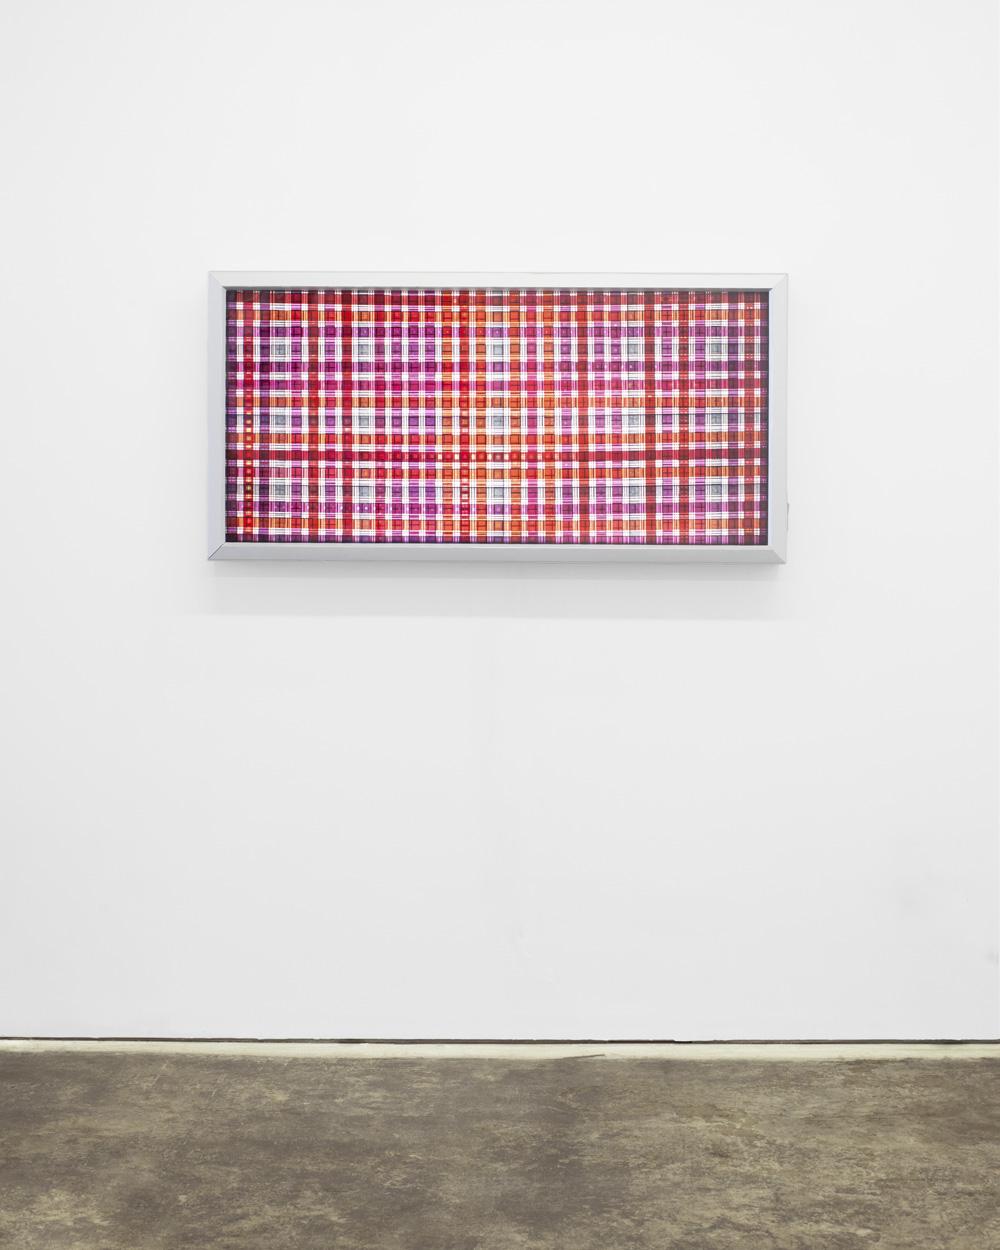 Mosaic (Red). 35mm Celluloid Film,Fluorescent Lights, Plexiglas,Custom Lightbox.52x26x6.Richard Kerr. 2014.